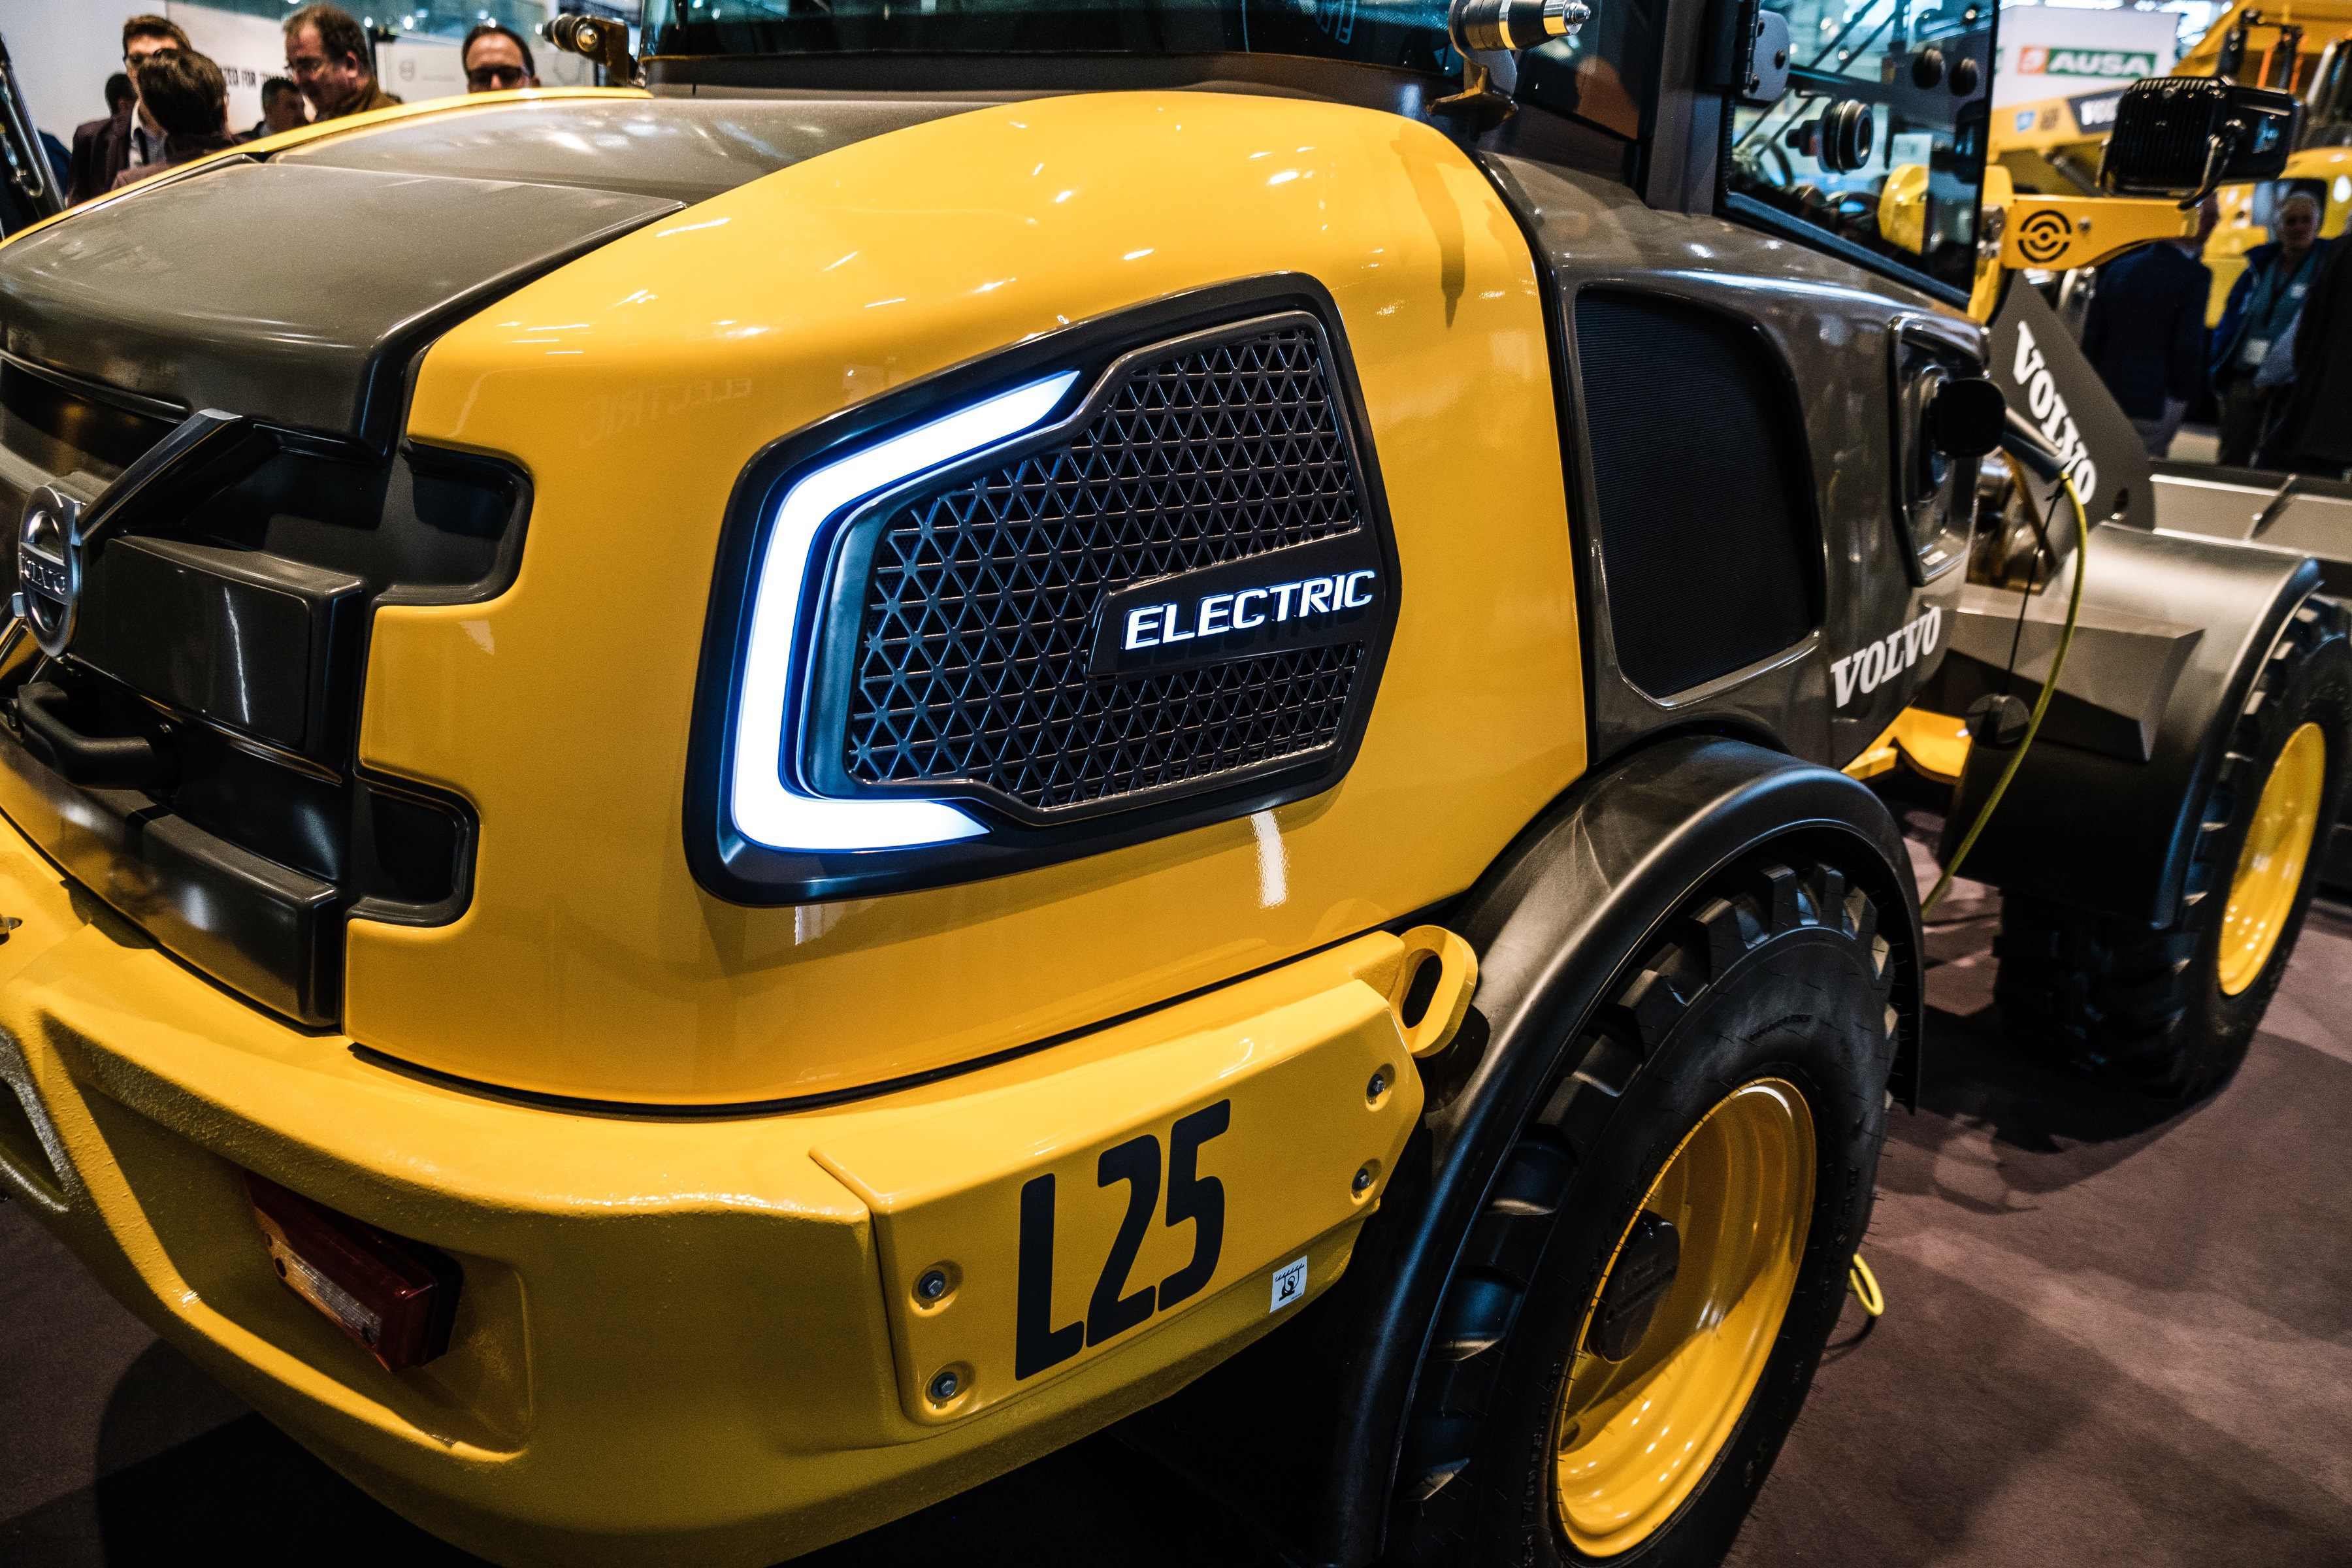 Volvo L25 electric wheel loader